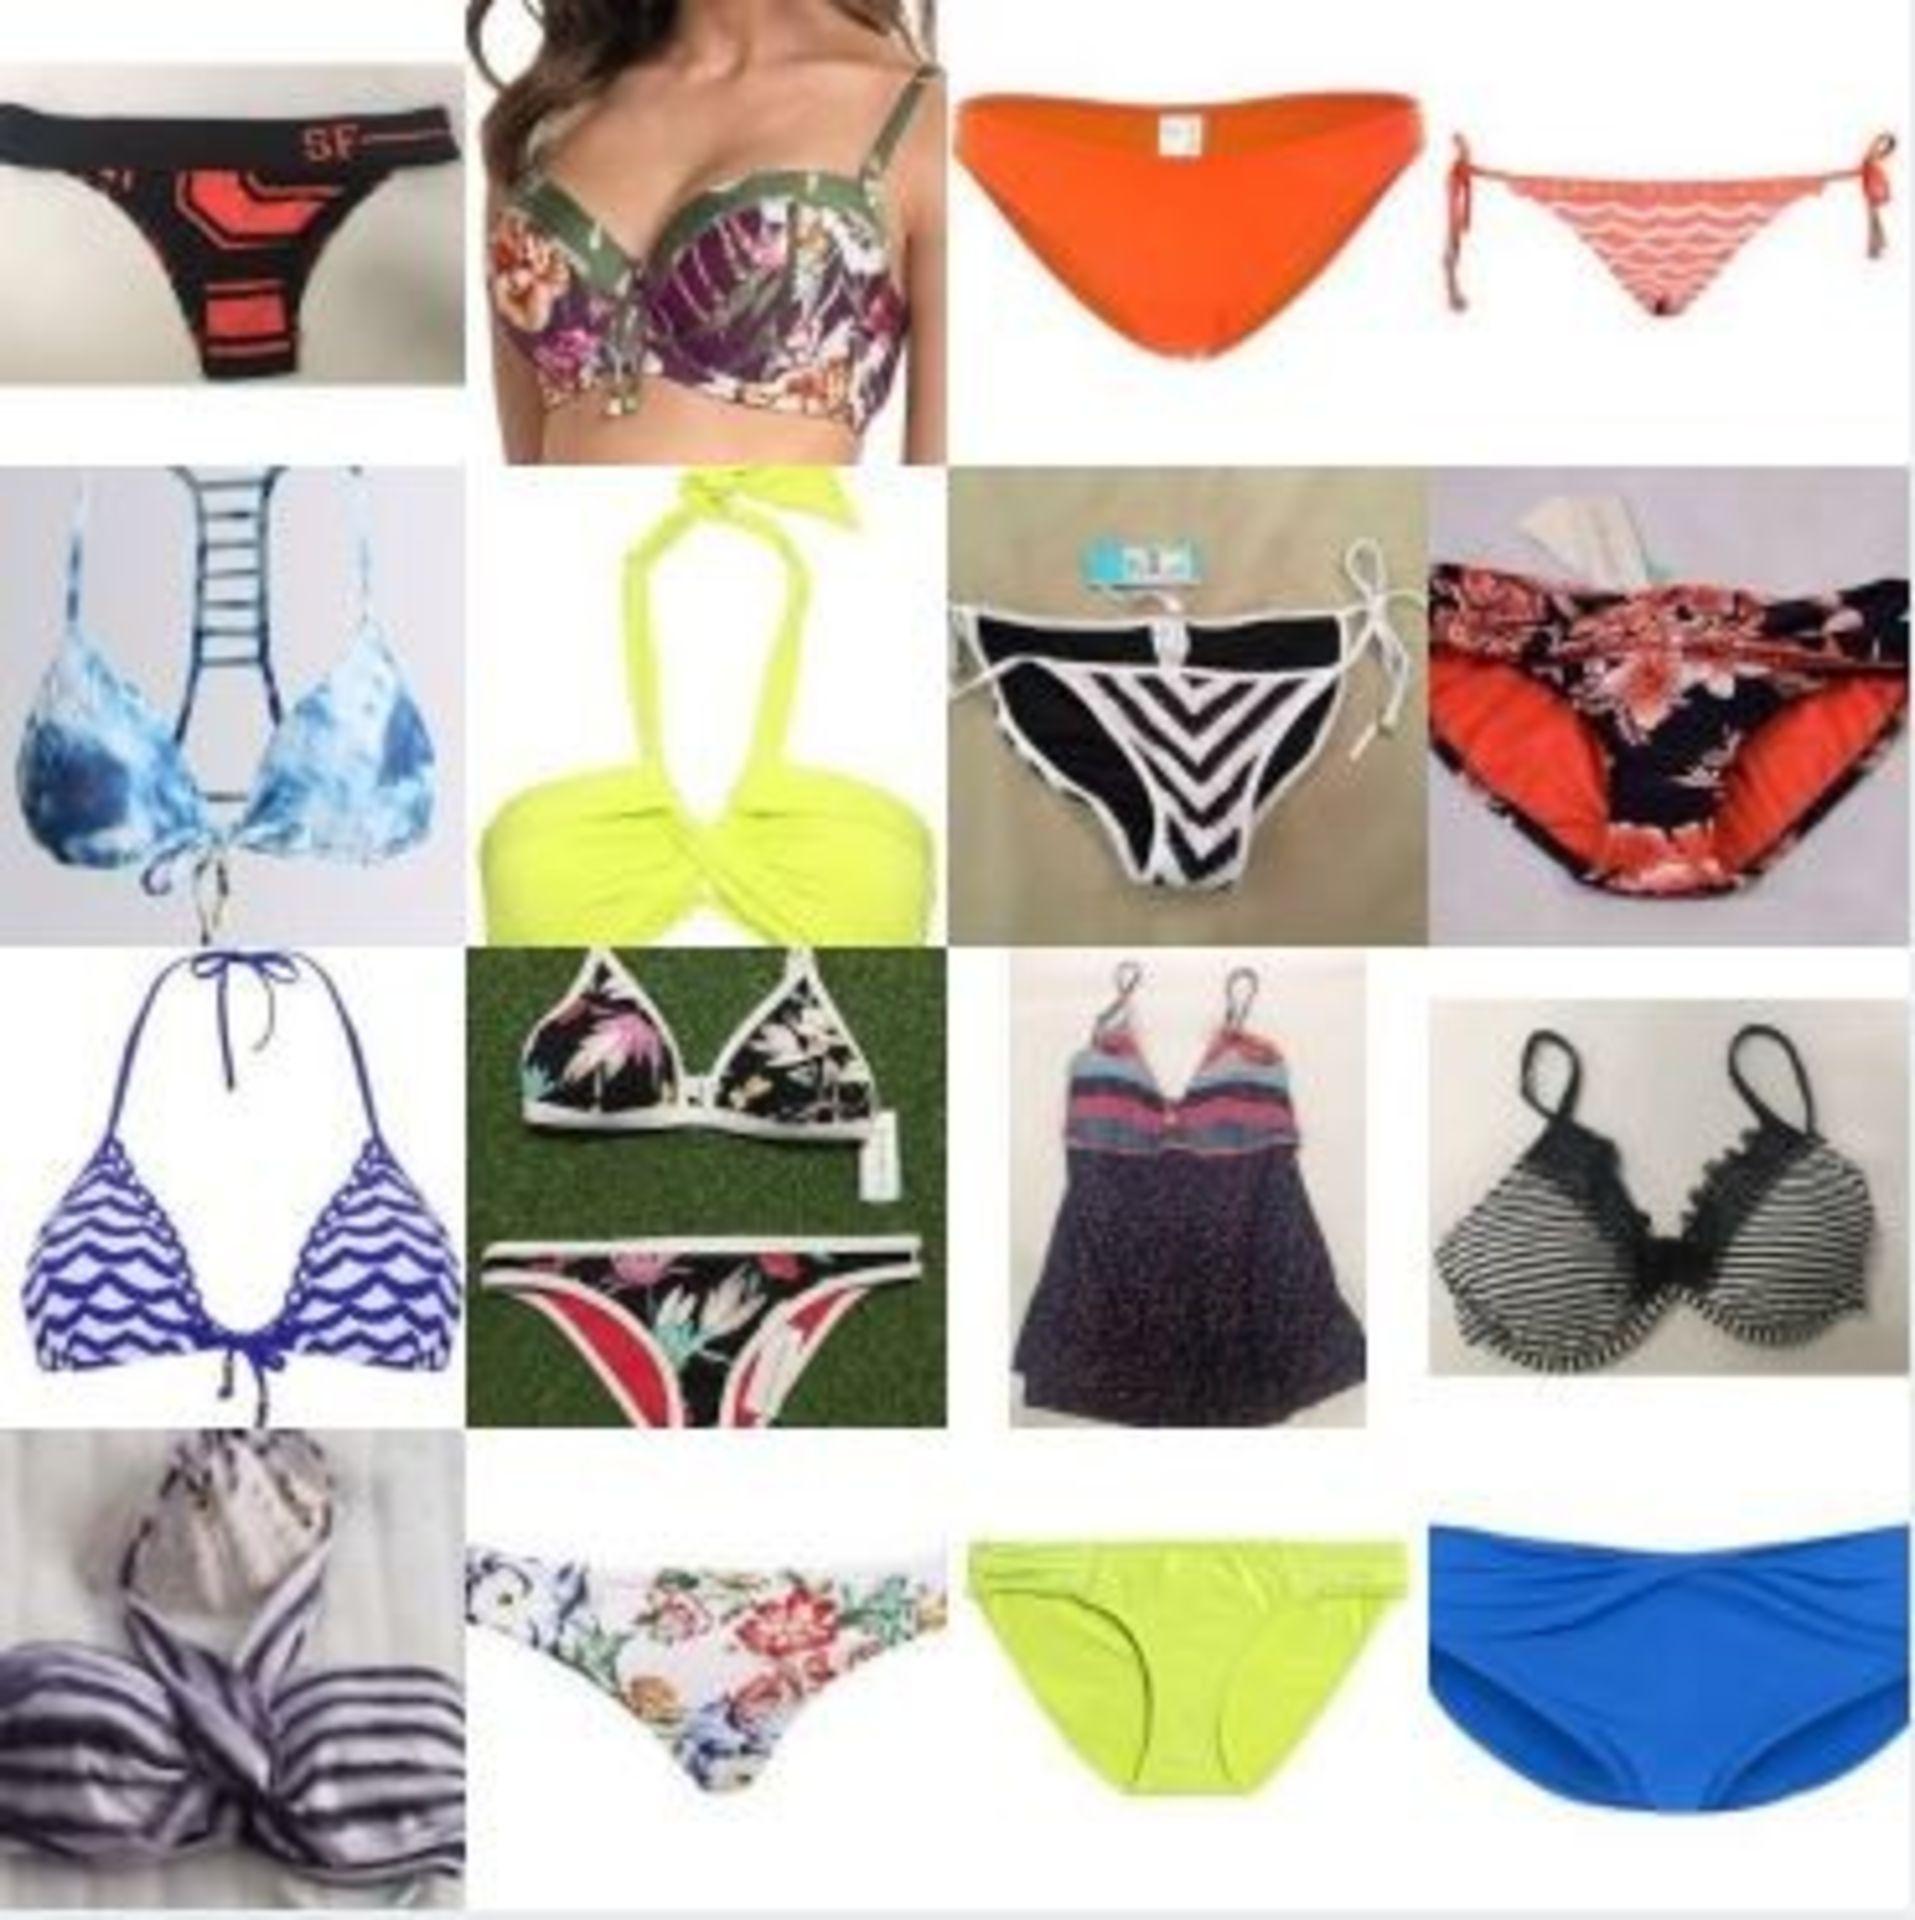 Lot 19 - Sourced From Big Brand Bikini Manufacturer SeaFolly: